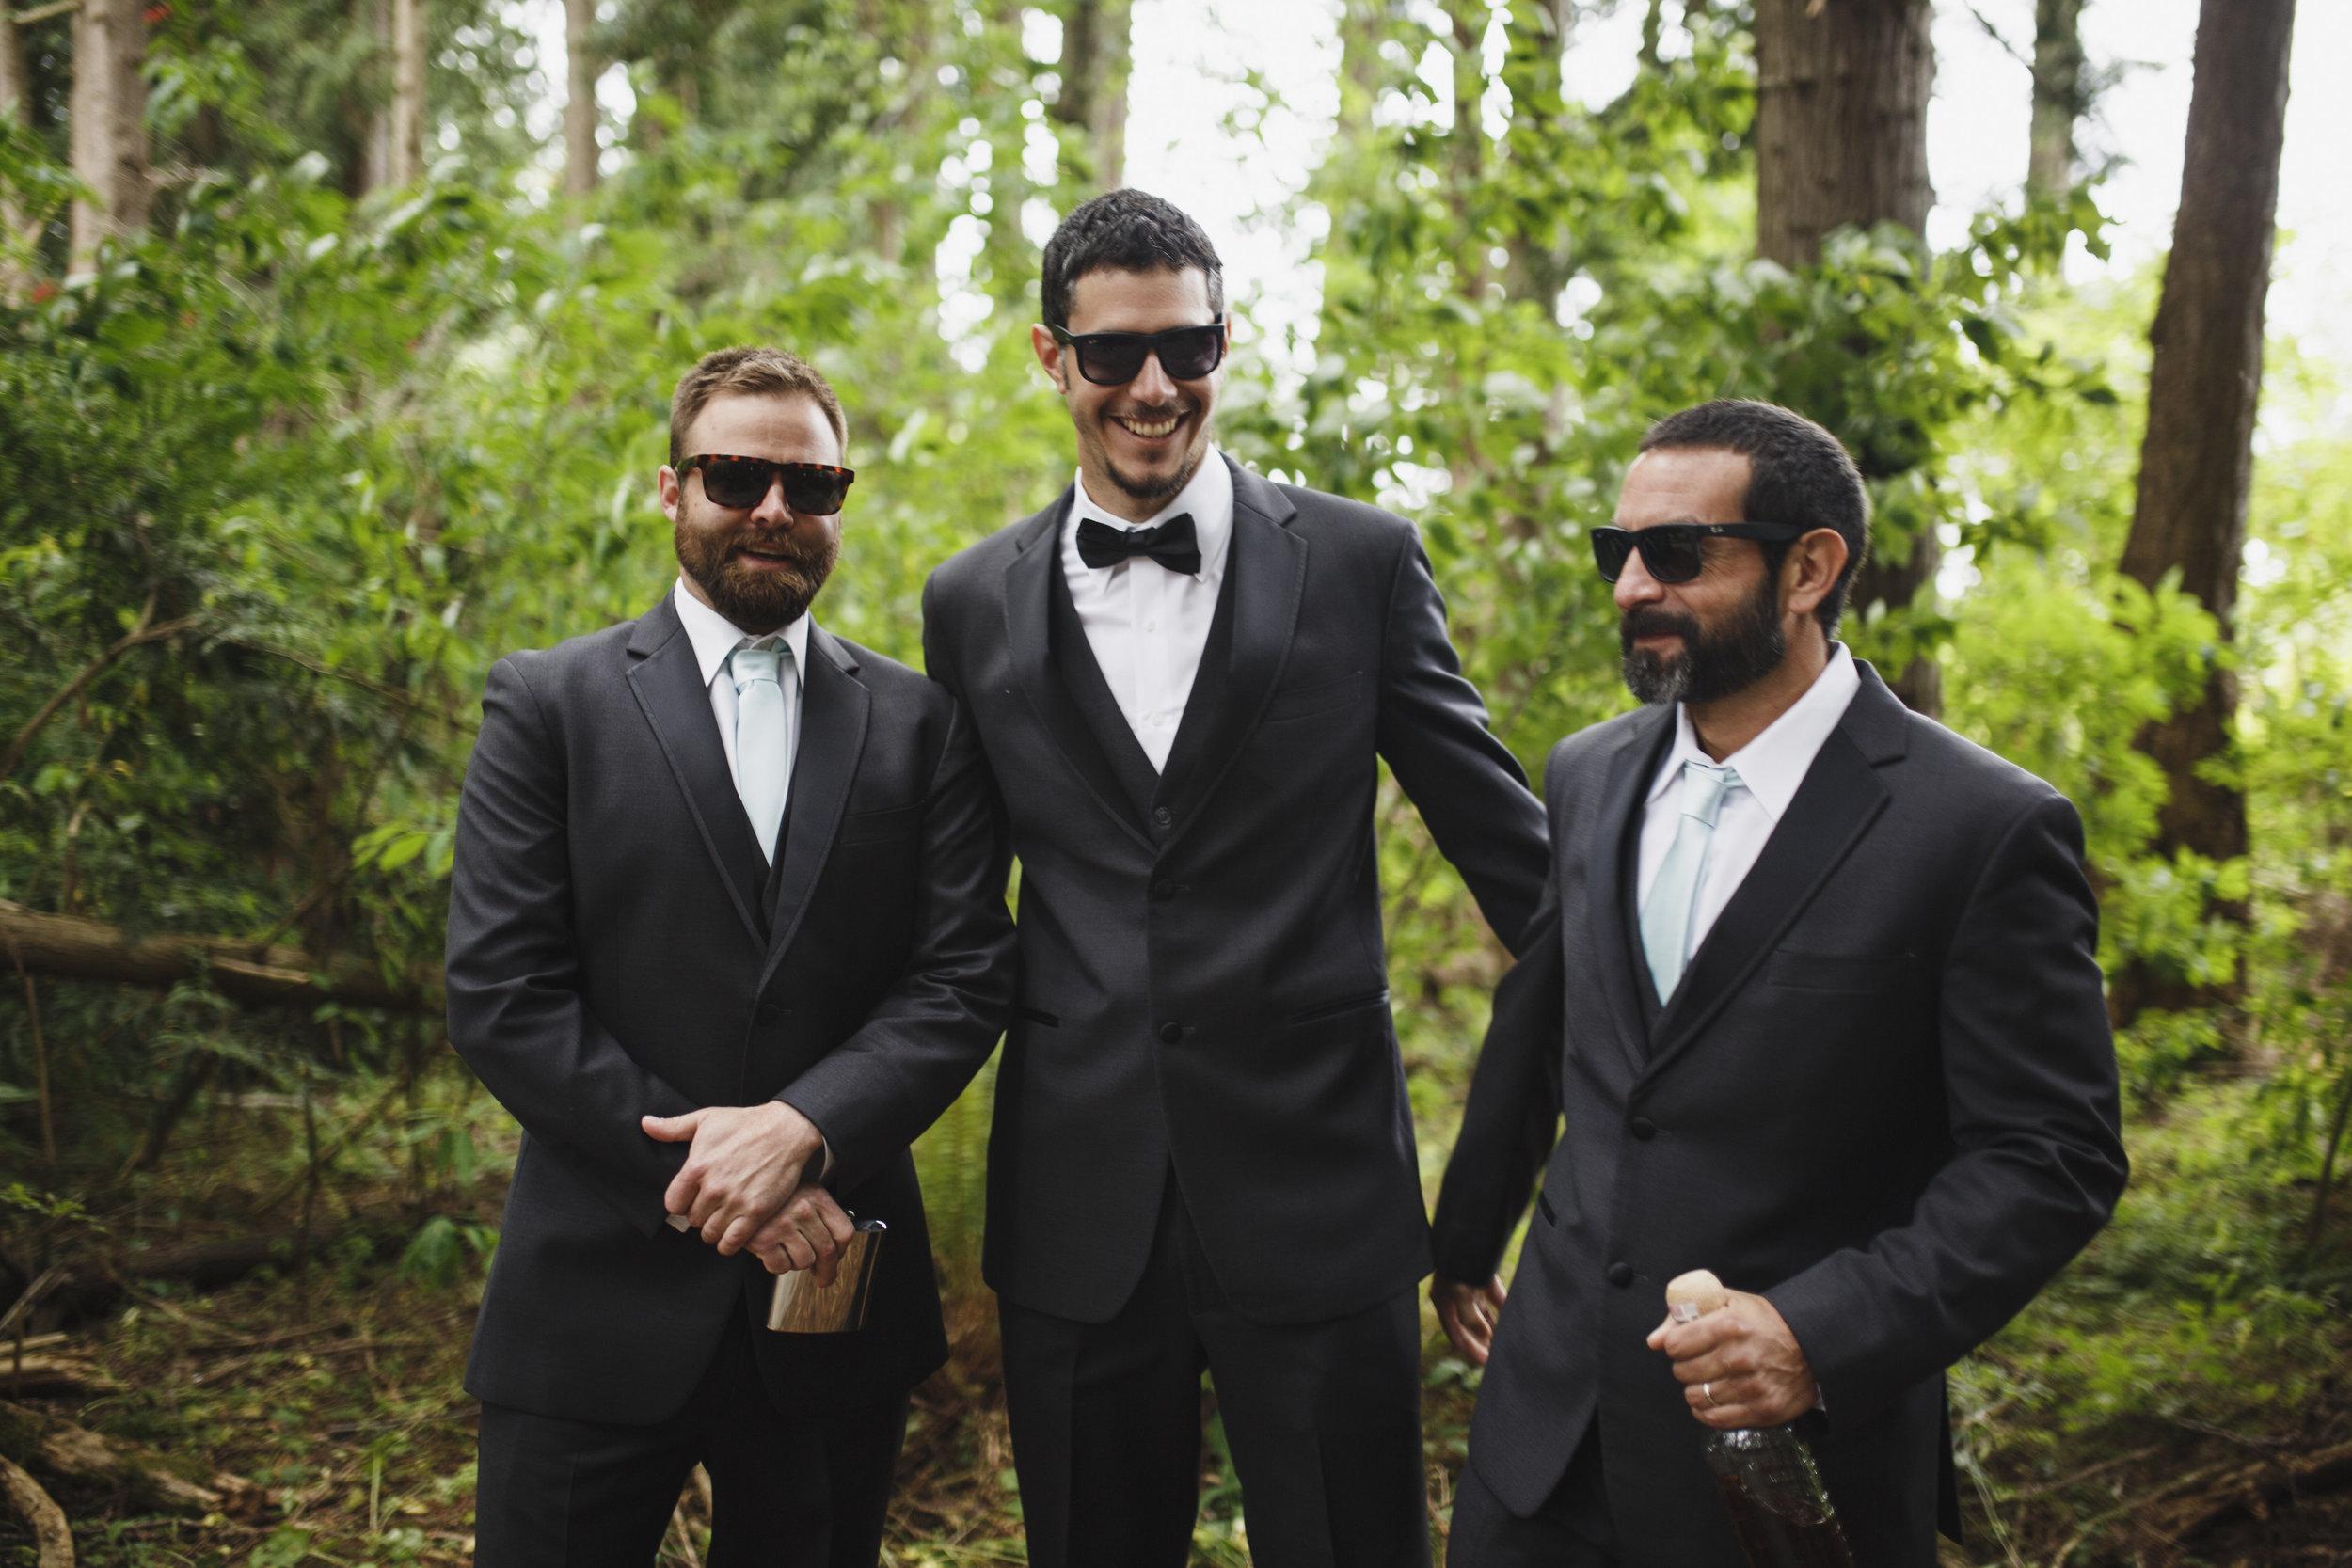 Groomsmen Forest wedding Tofino Sea Cider Vancouver Island